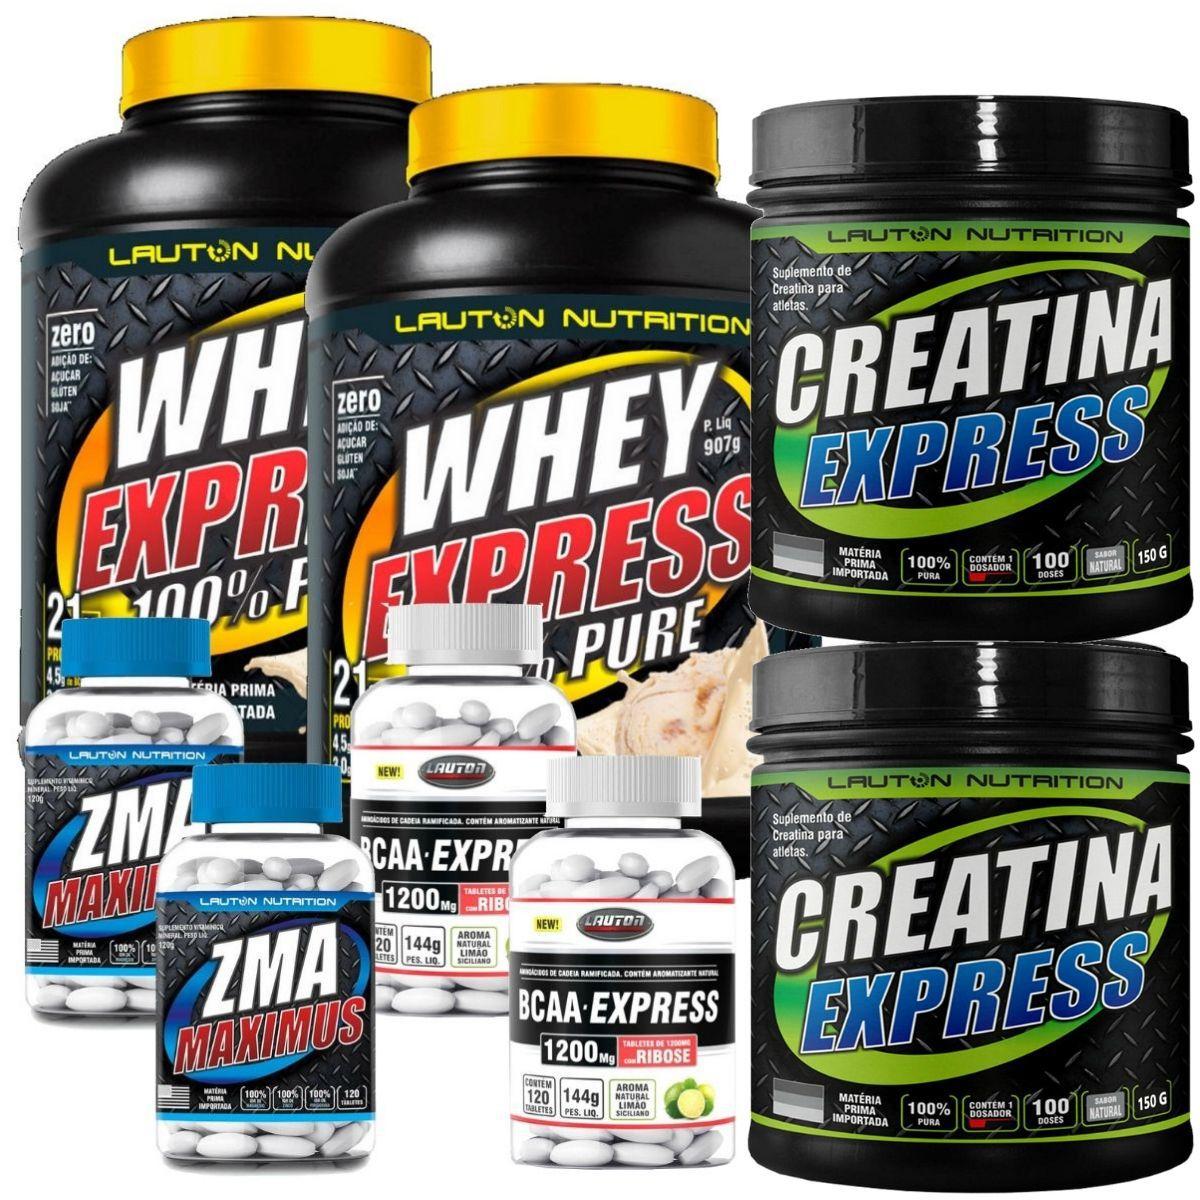 Kit 2 Whey Protein 900g + 2 Creatina 100g + 2 BCAA 120 Tabs + 2 ZMA 120 Tabletes - Lauton Nutrition